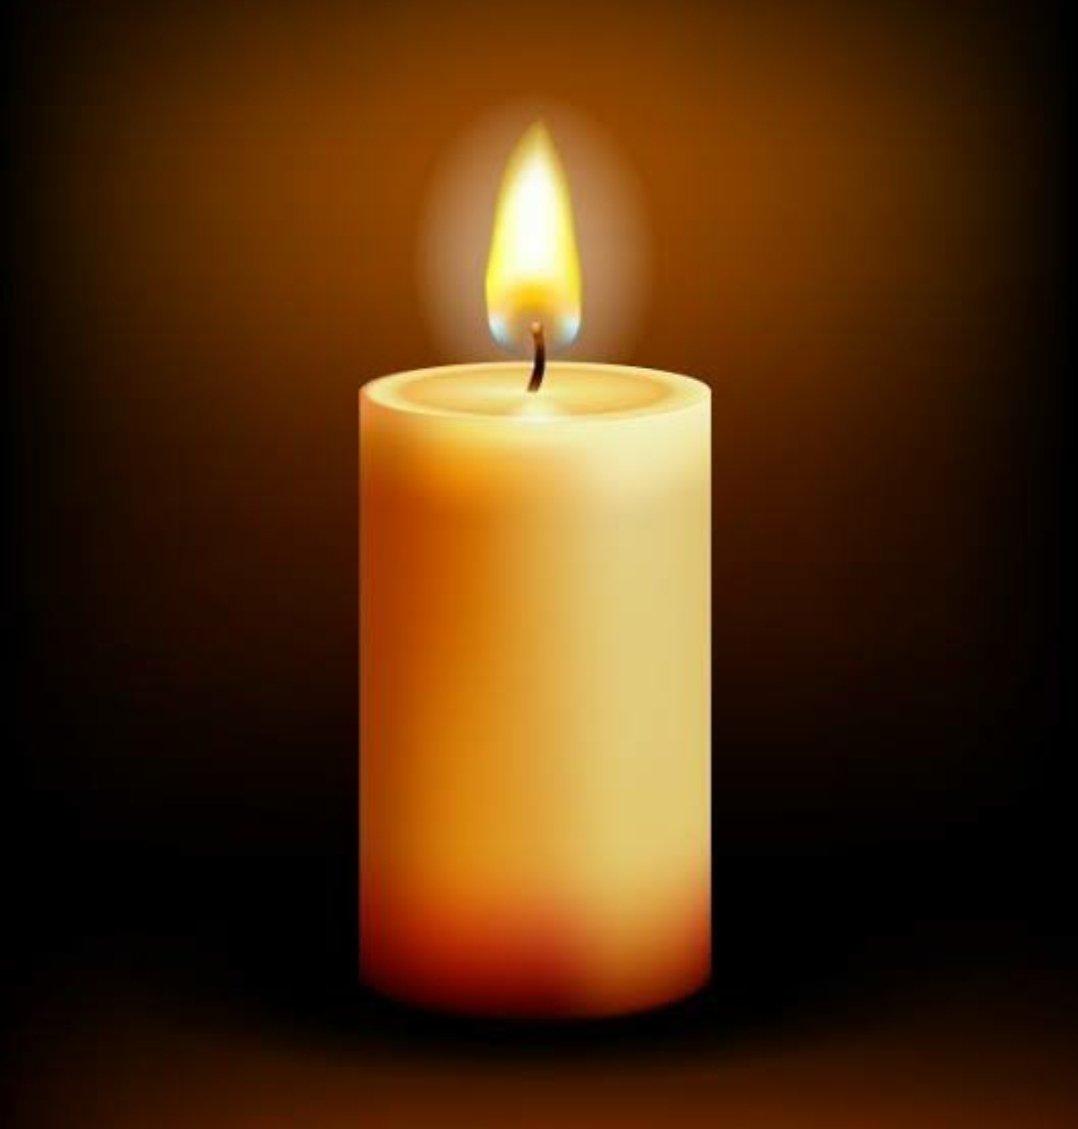 #RIPJacksonMthembu #EndCovid #EnoughIsEnough